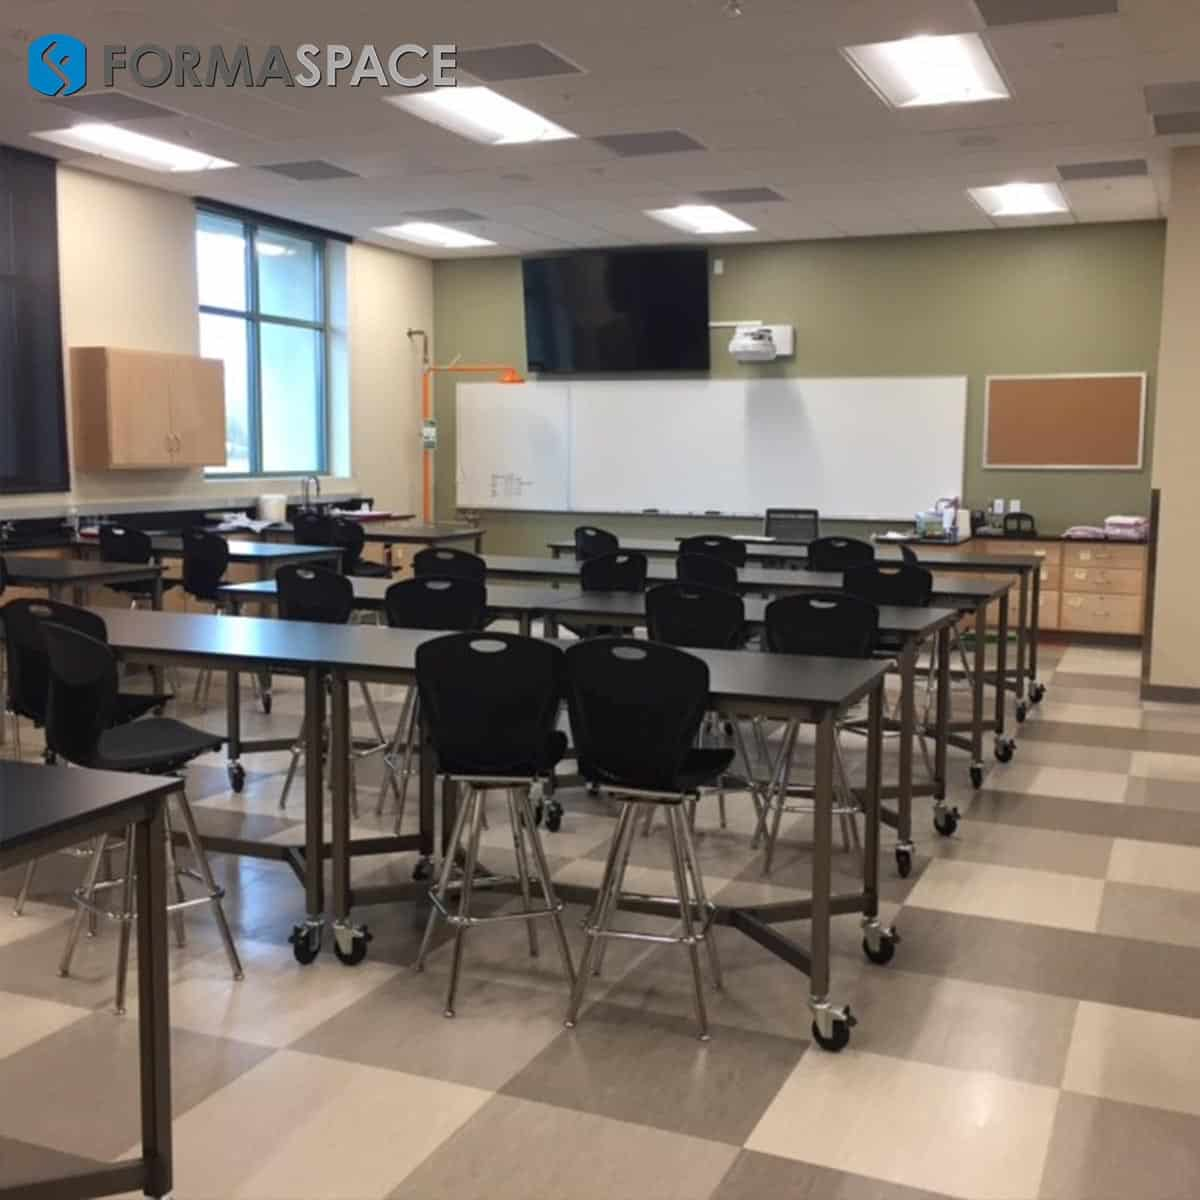 phenolic top classroom benches with y spreader